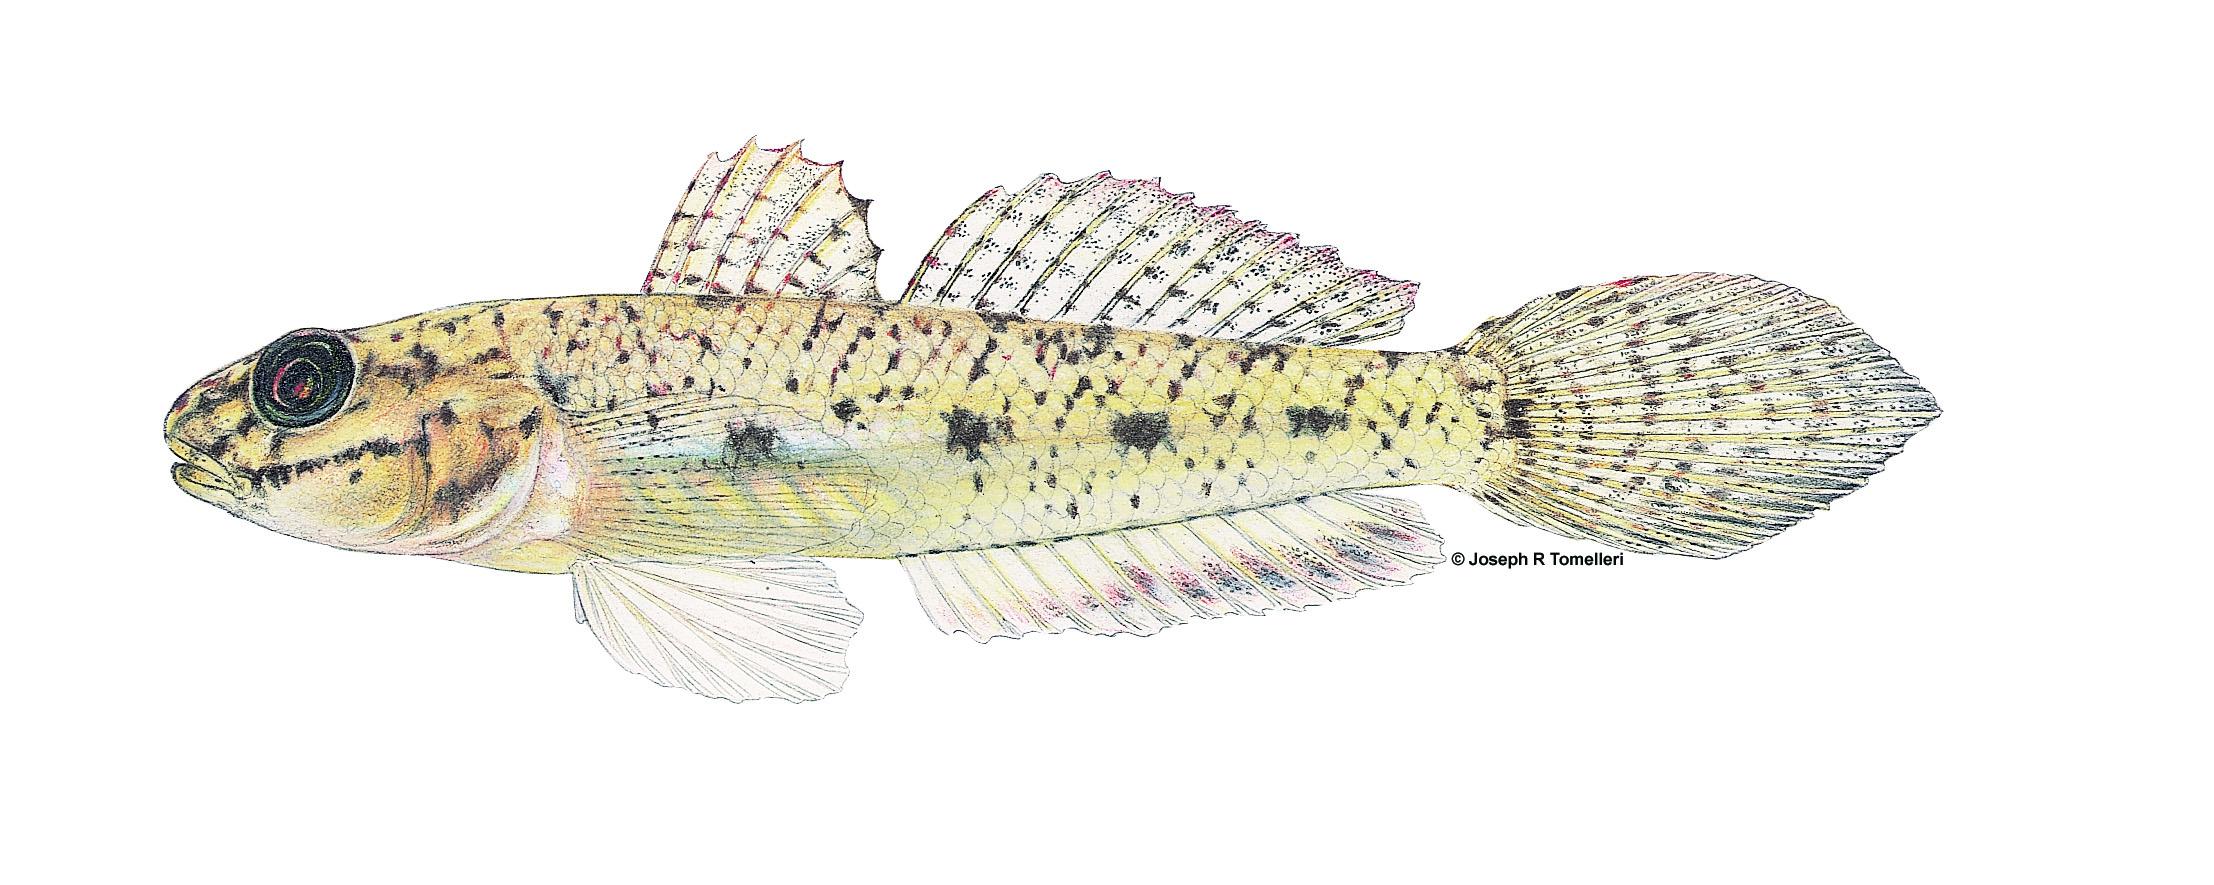 ctenogobius_shufeldti_american_freshwater_goby_0